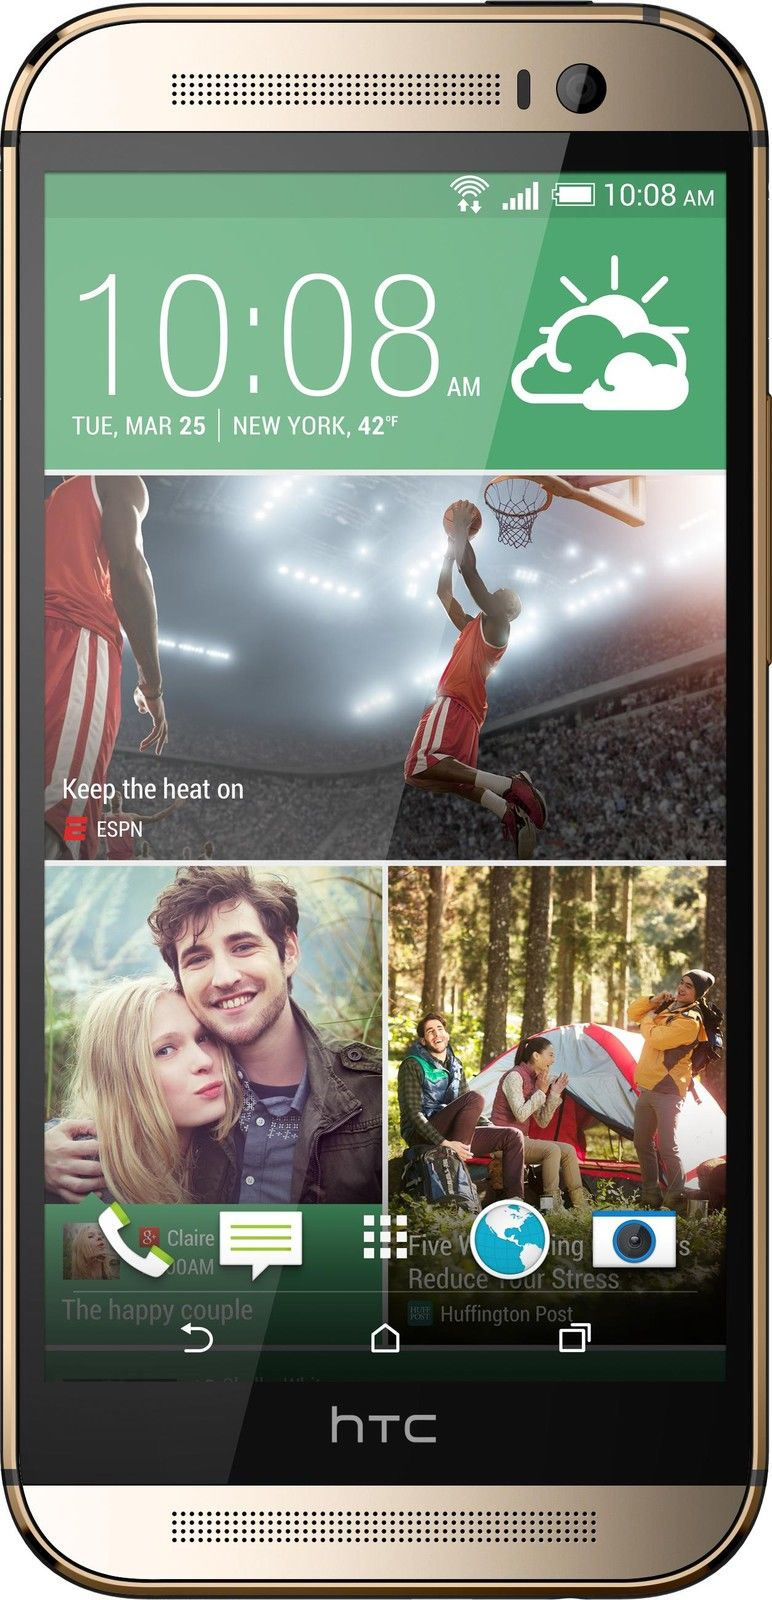 HTC One M8 - 32GB - Amber Gold (Verizon) Smartphone